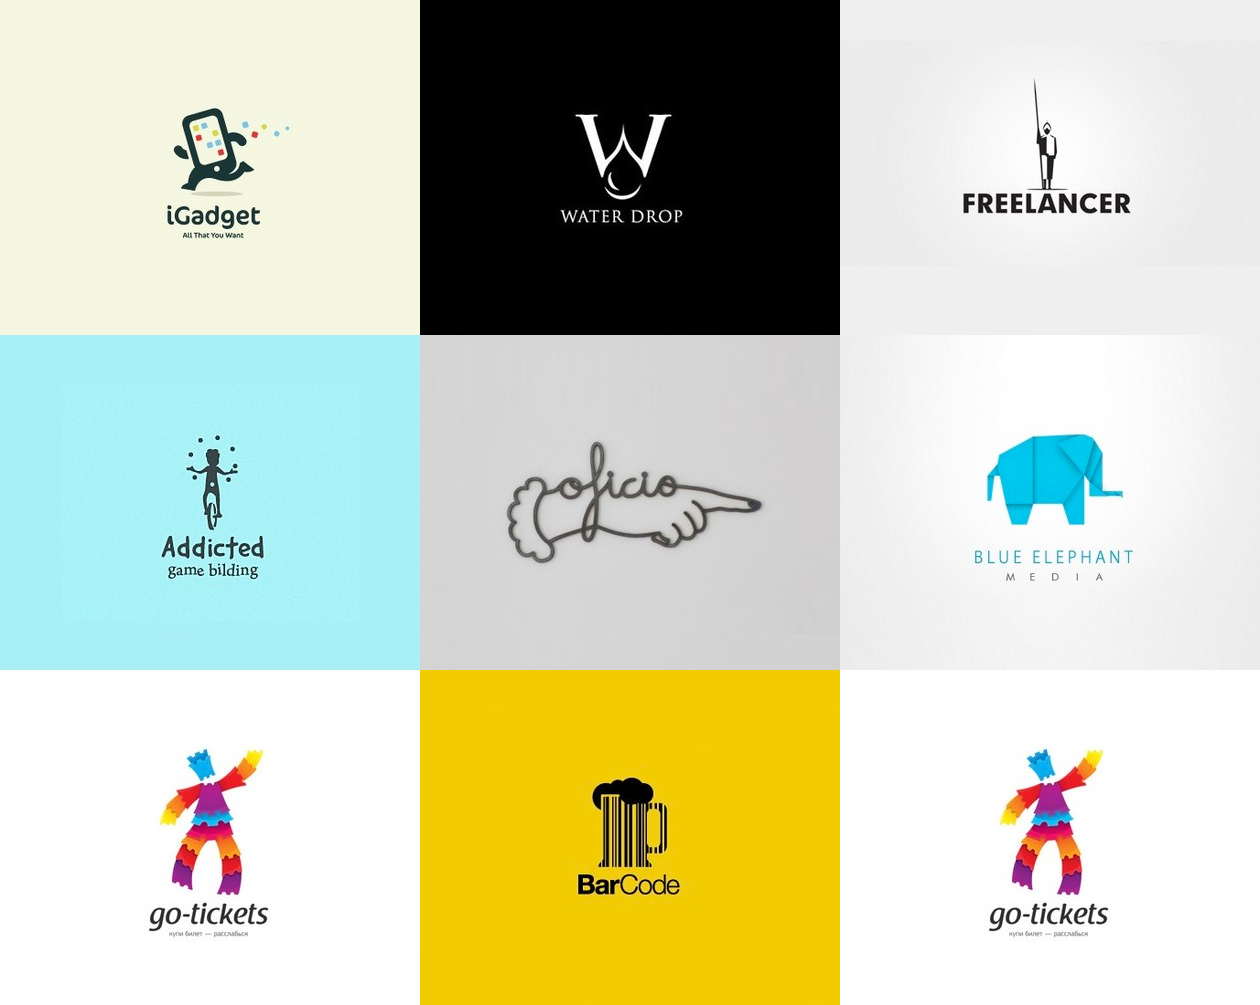 креативные логотипы 2